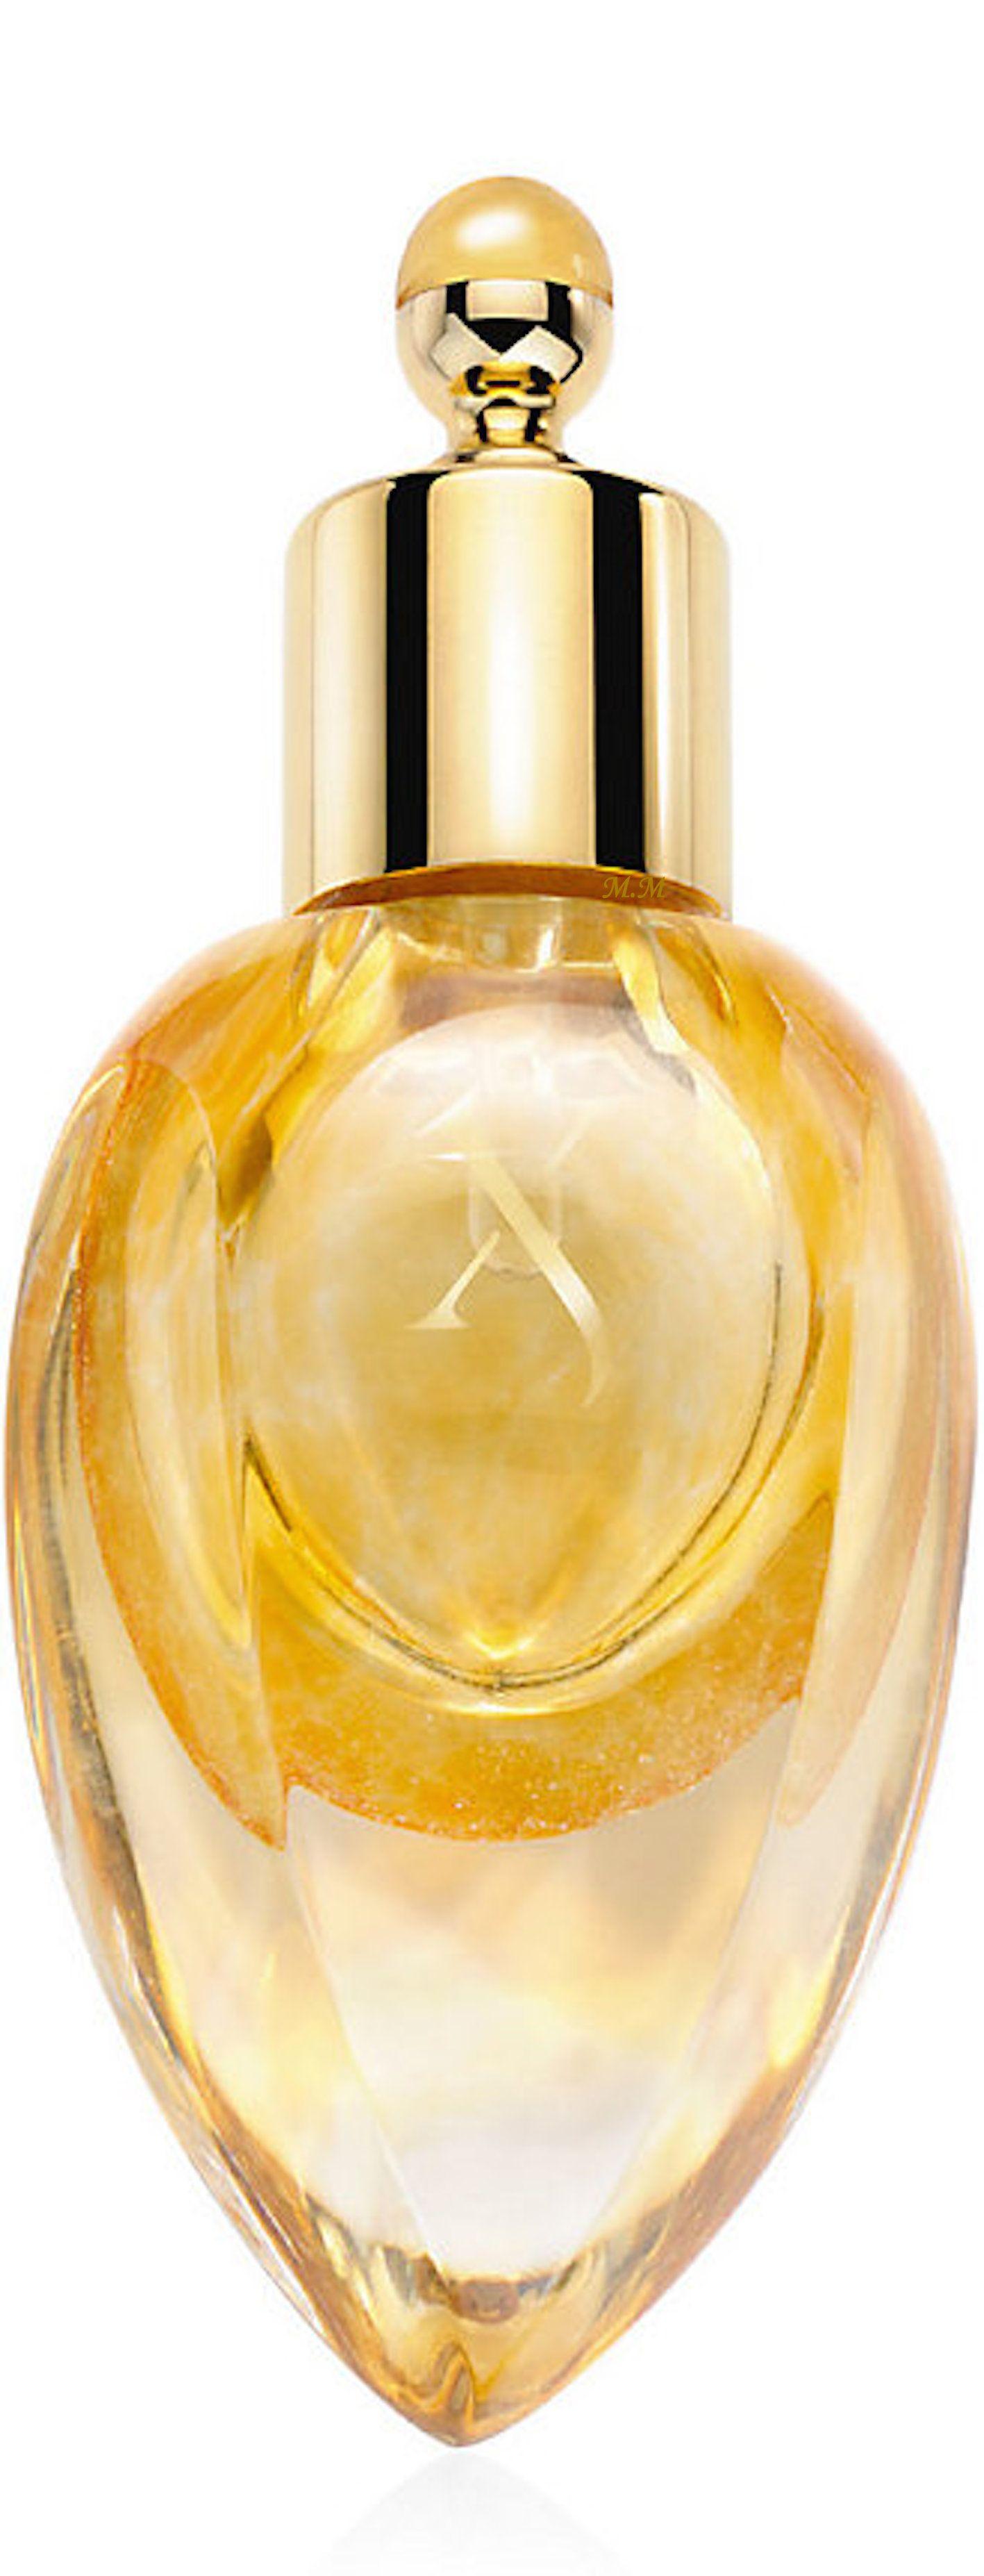 Xerjoff Perfume Perfume Gift Pure Oils